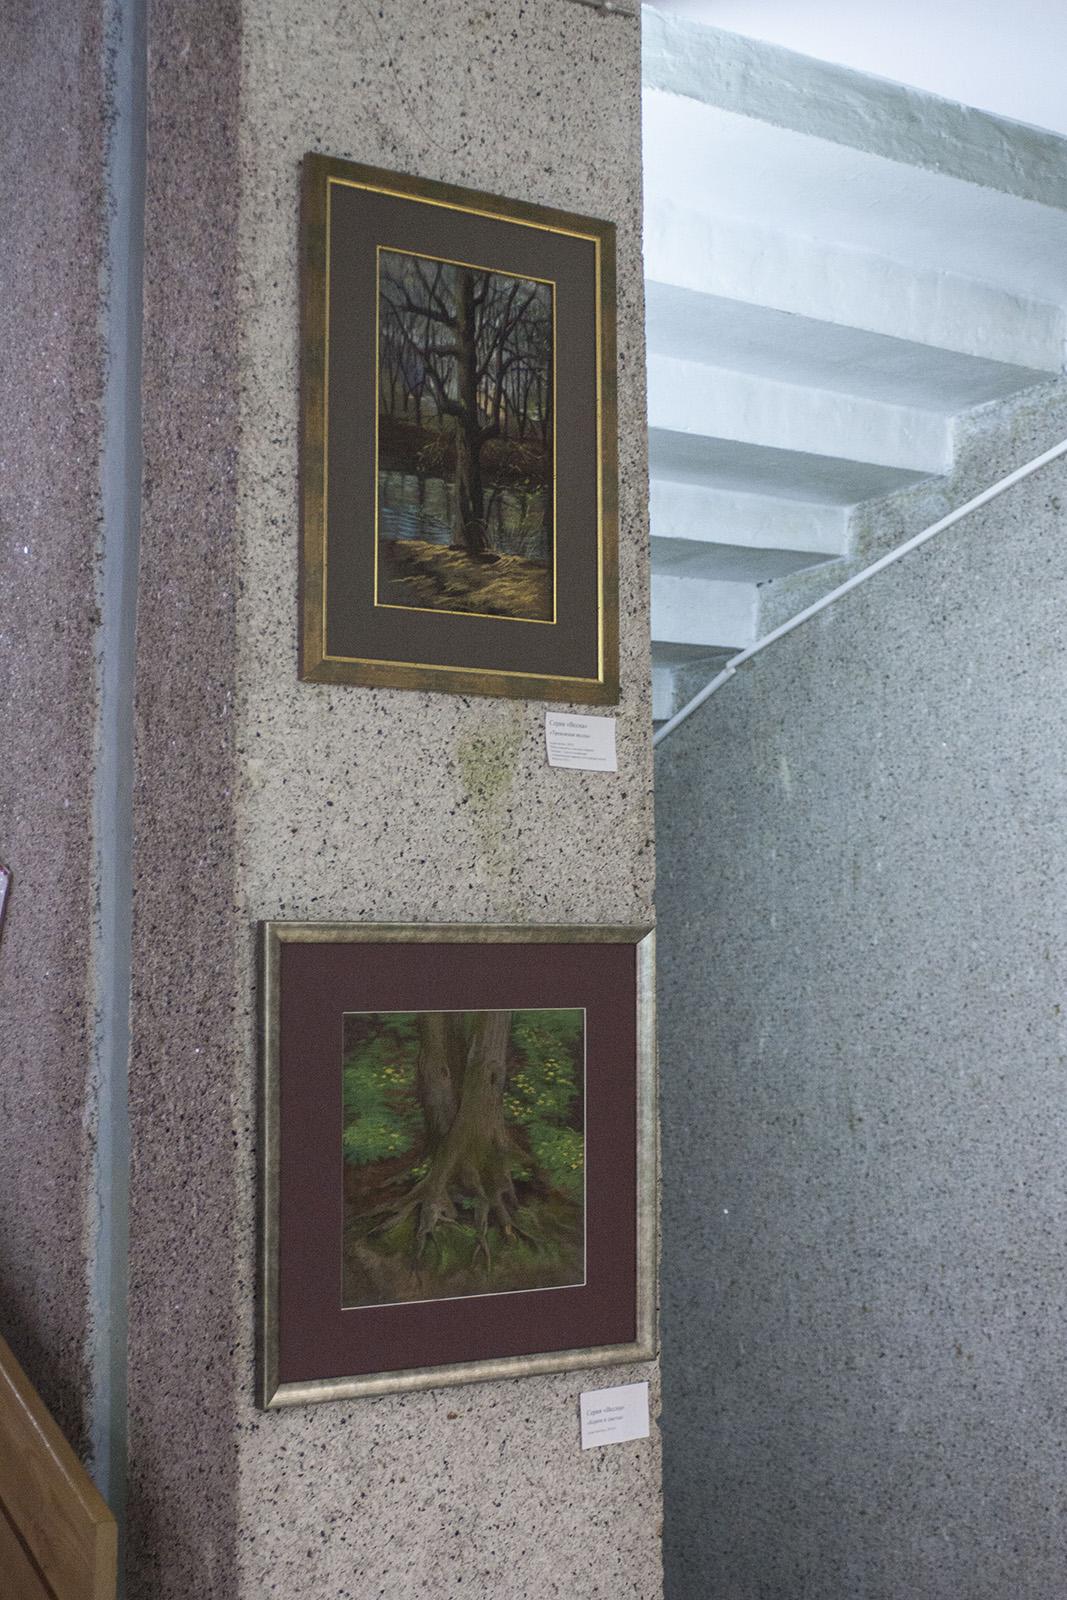 Solo art exhibition